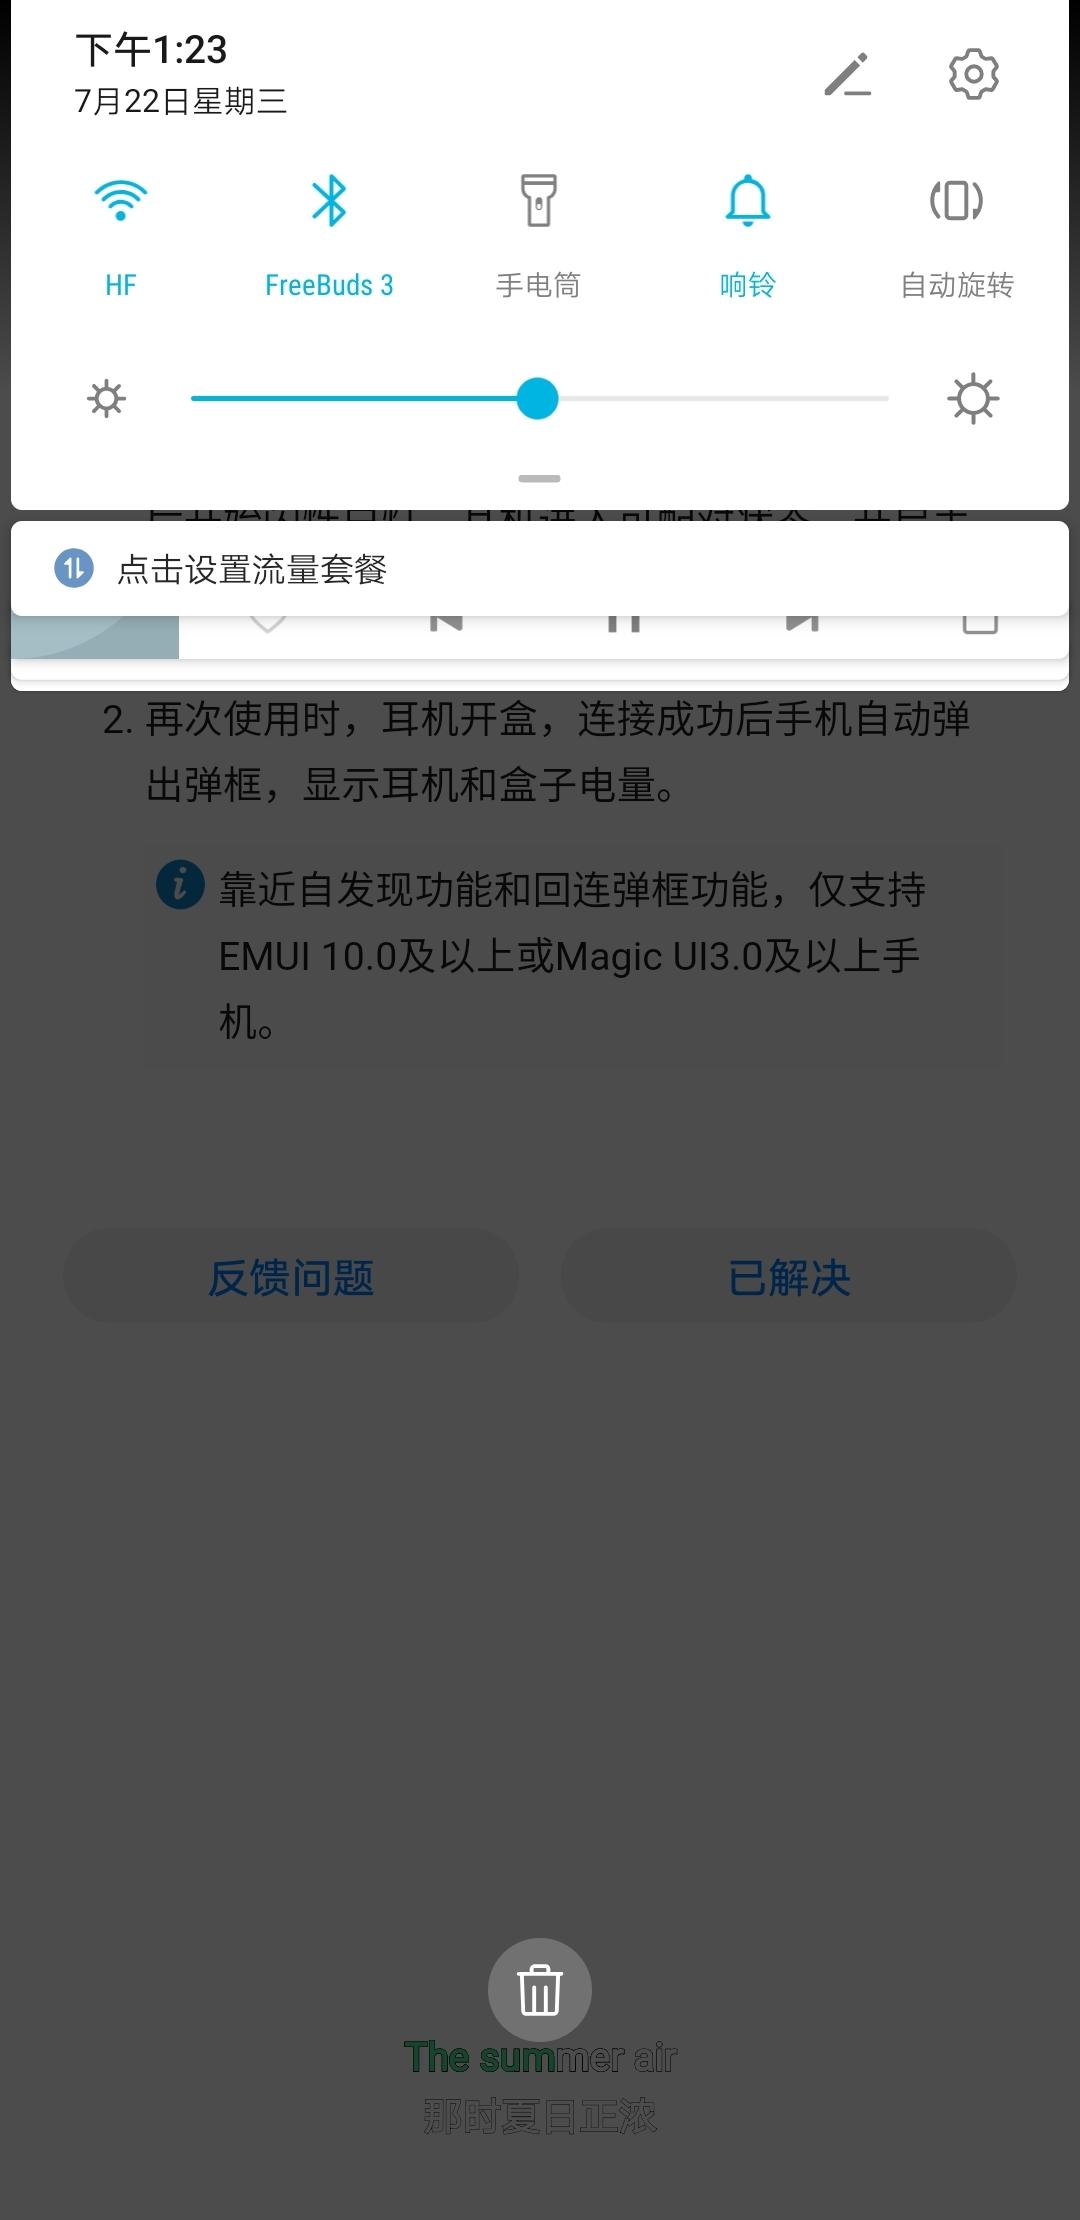 Screenshot_20200722_132304_com.huawei.smarthome.jpg